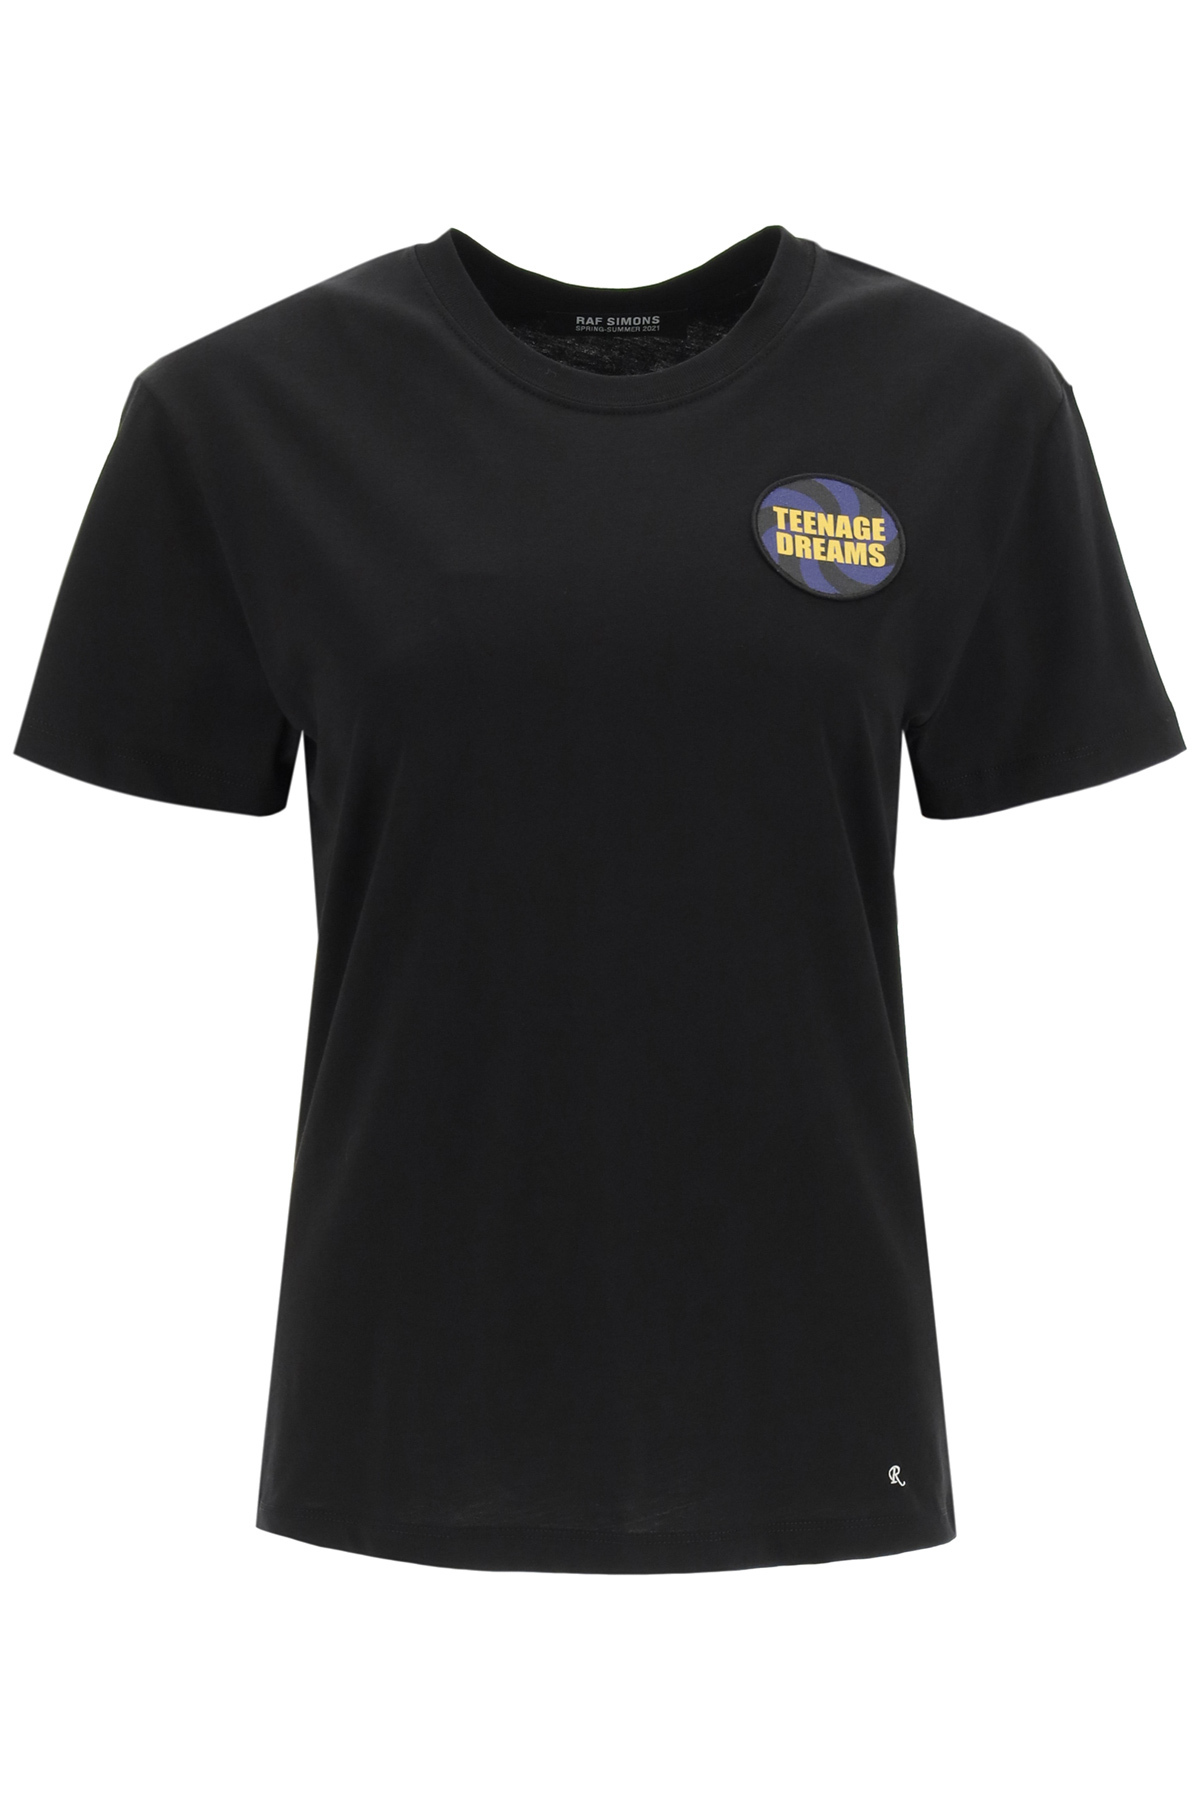 Raf simons t-shirt con patch teenage dreams